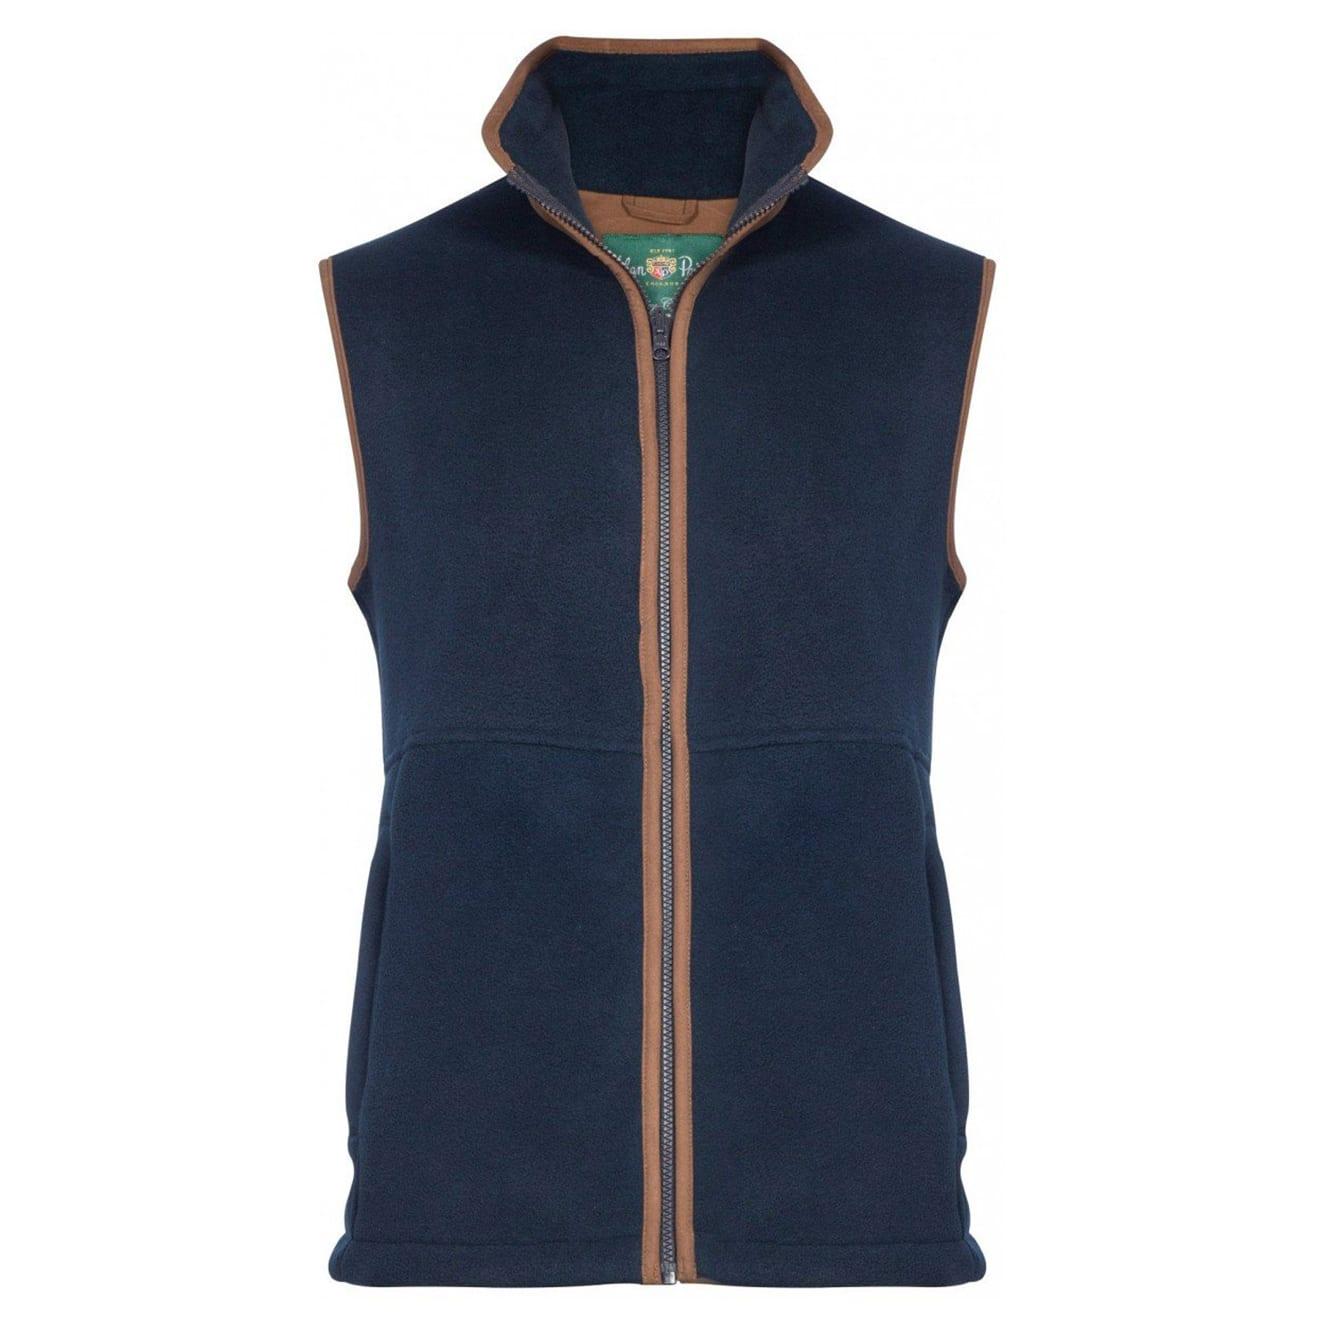 Alan Paine Aylsham fleece vest dark navy